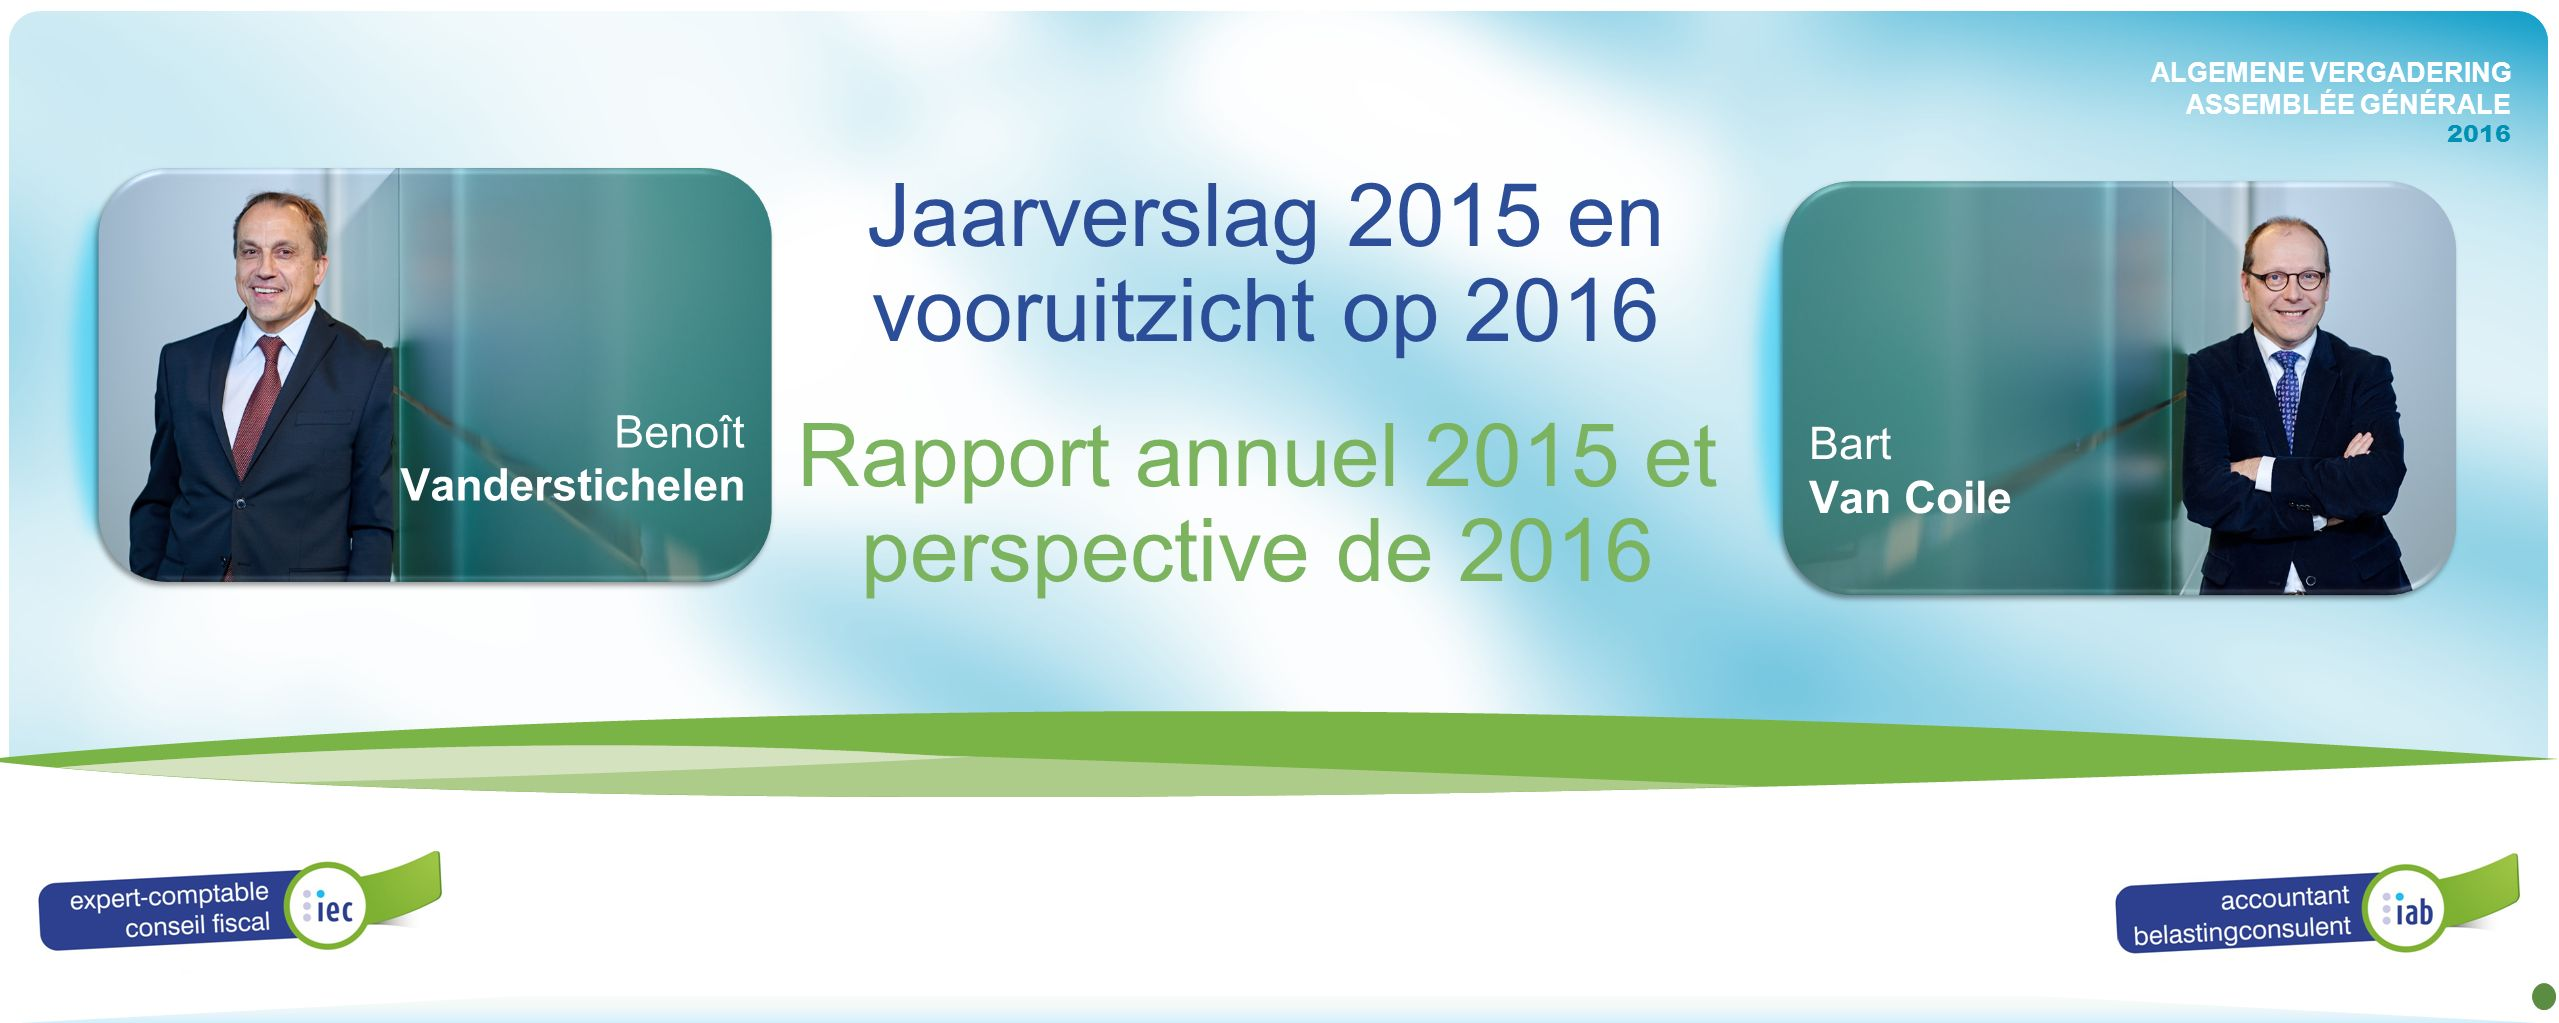 ALGEMENE VERGADERING ASSEMBLÉE GÉNÉRALE 2016 Rapport annuel 2015 et perspective de 2016 Benoît Vanderstichelen Bart Van Coile ALGEMENE VERGADERING ASSEMBLÉE GÉNÉRALE 2016 Jaarverslag 2015 en vooruitzicht op 2016